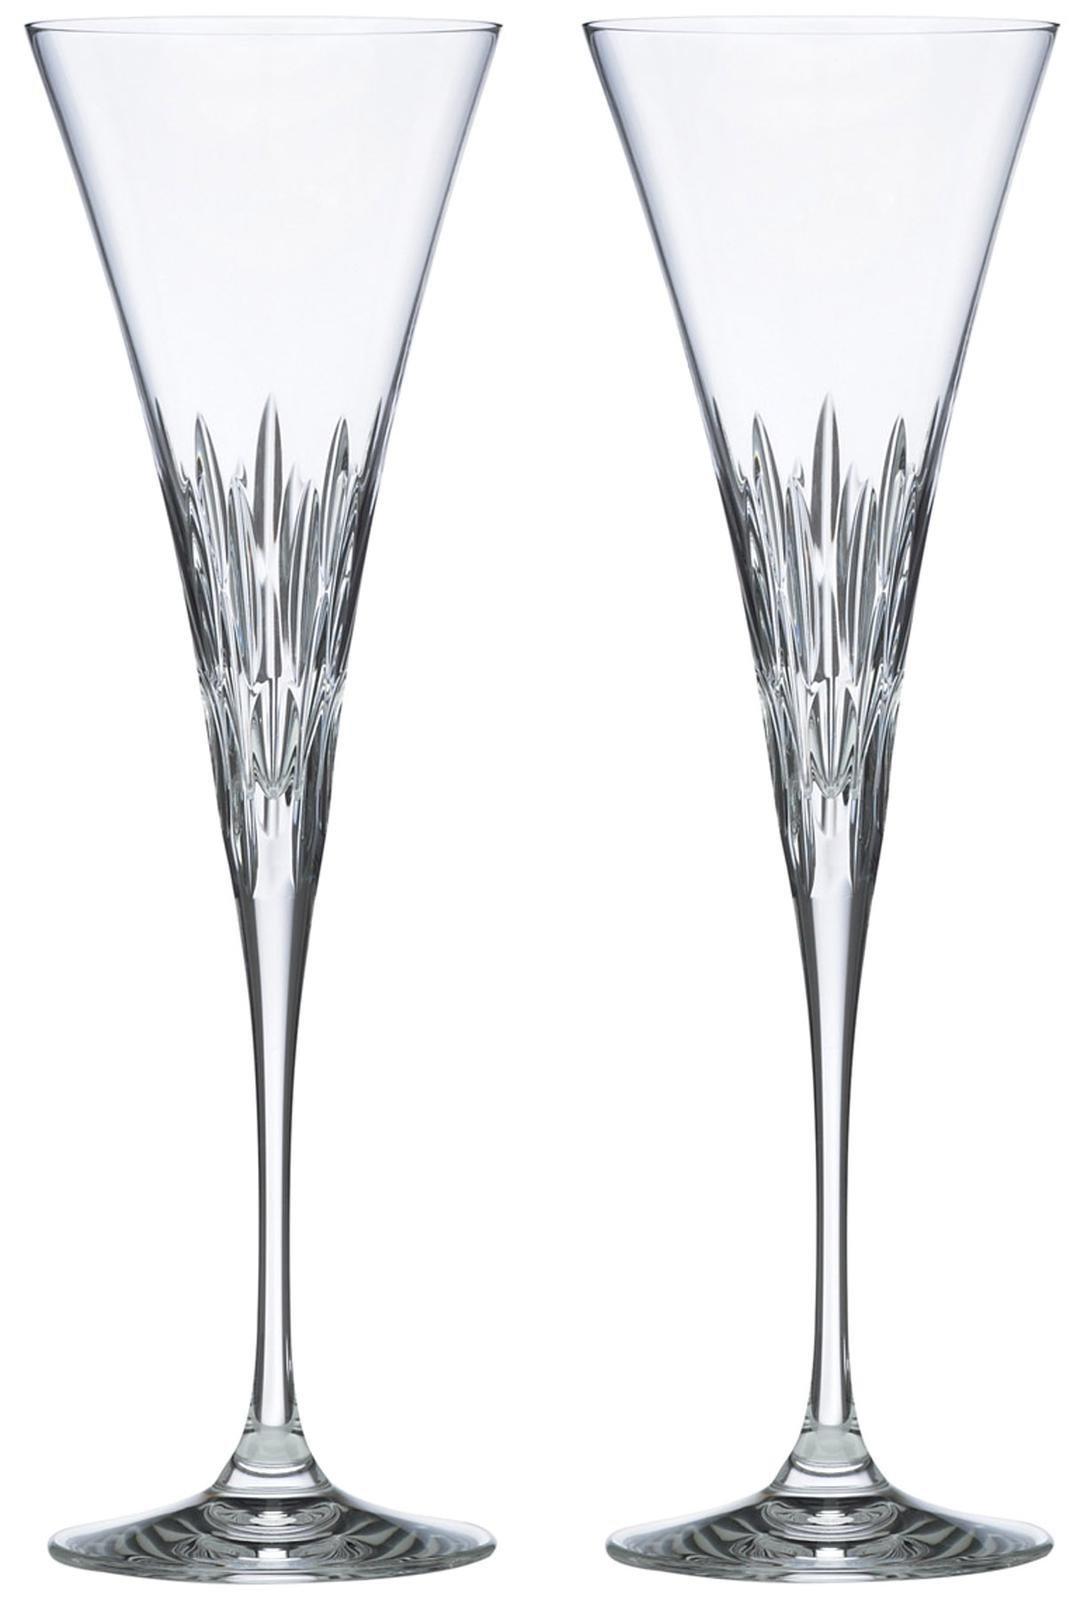 Lenox Firelight Crystal 2-piece Toasting Flute Set